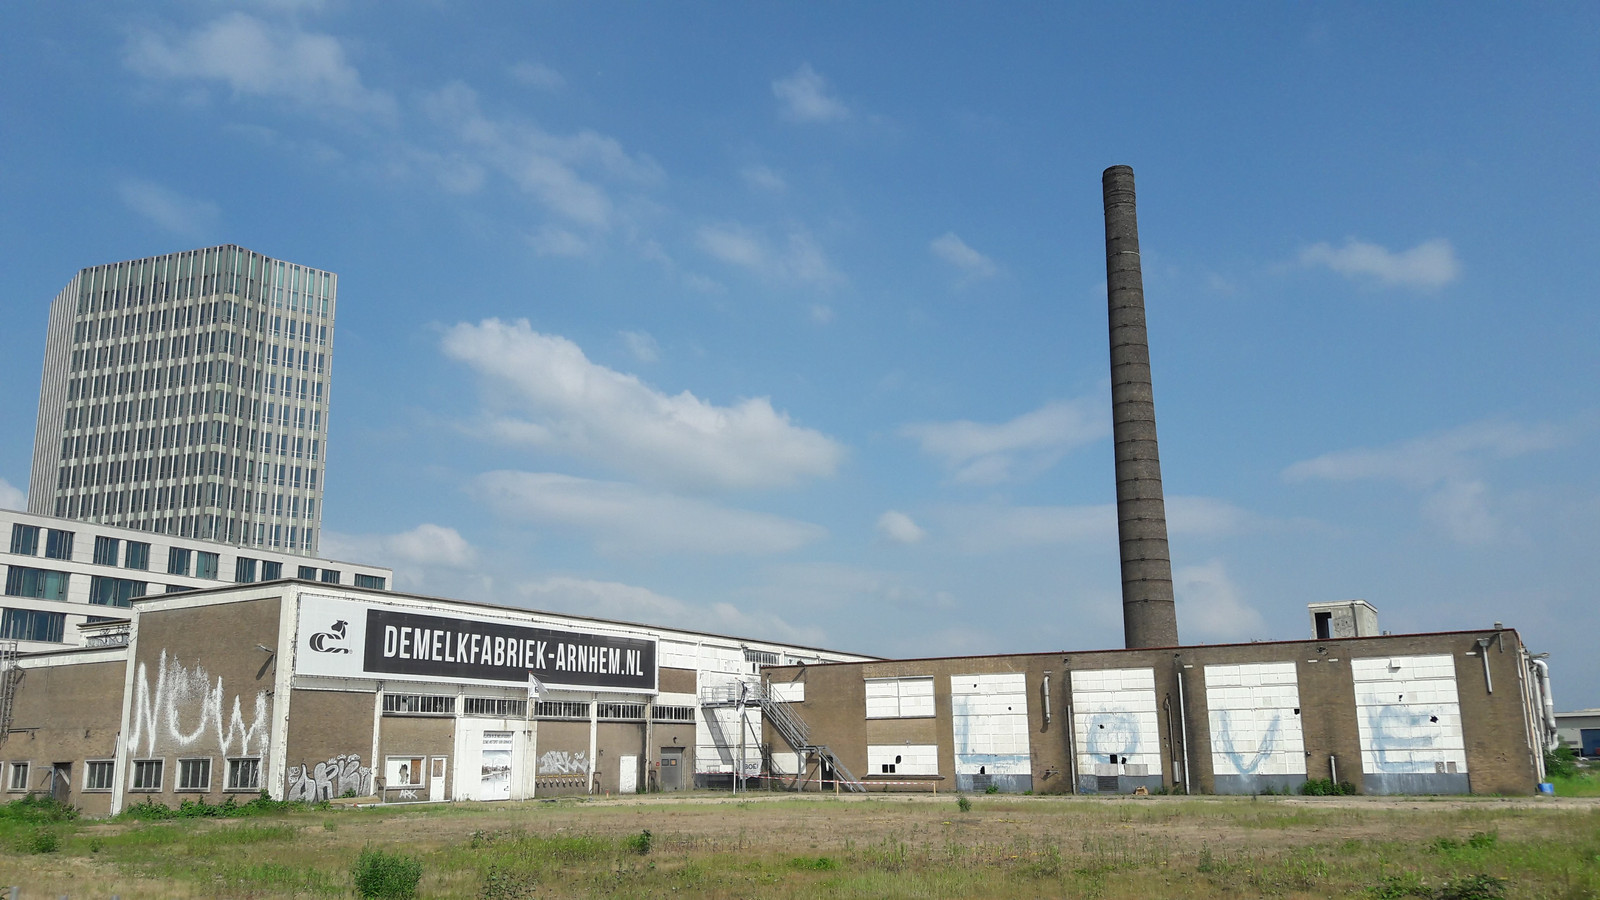 De Melkfabriek in Arnhem.